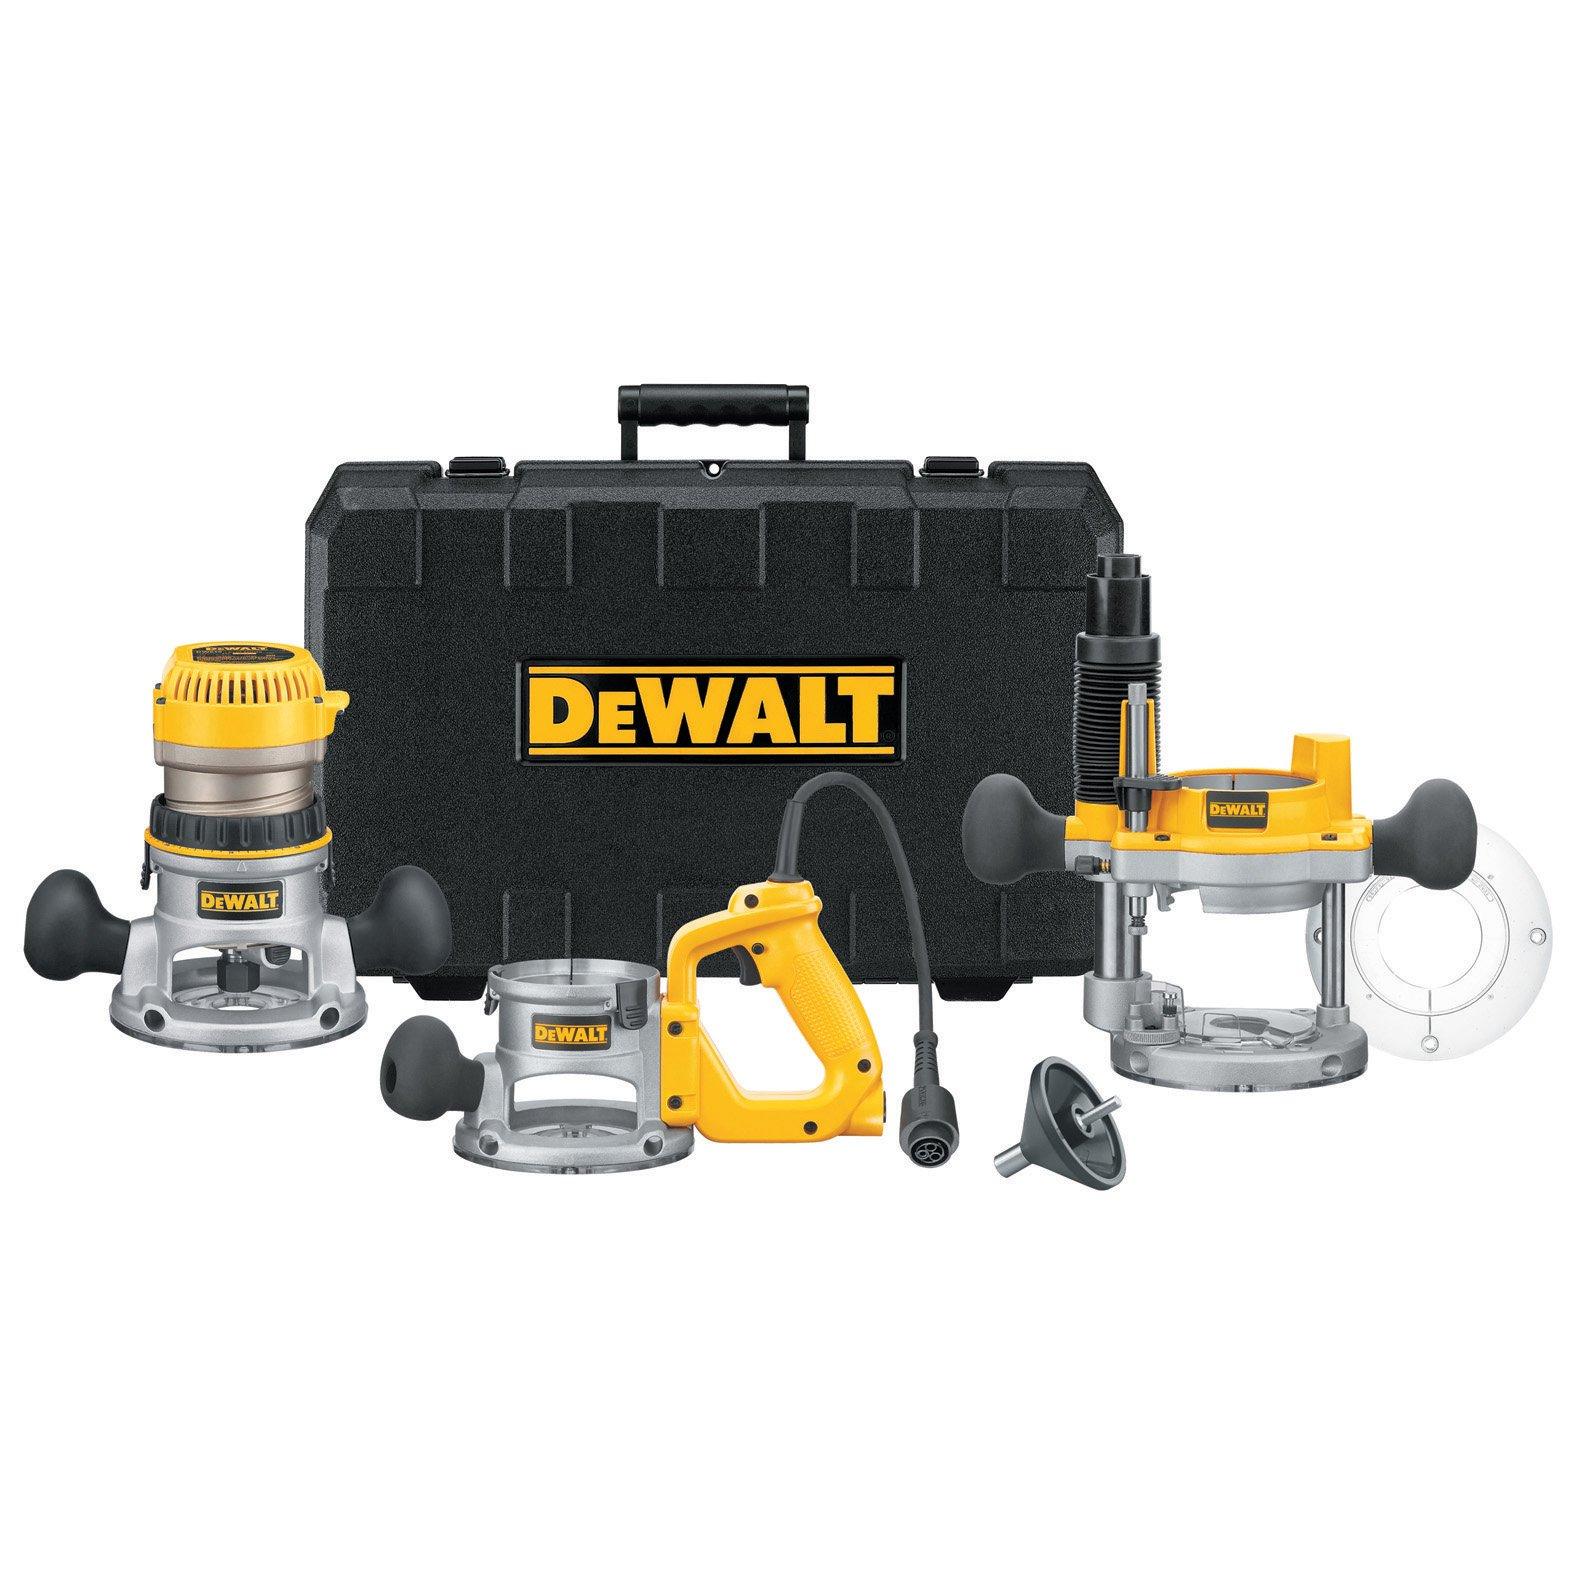 DEWALT DW618B3 12-Amp Fixed/Plunge Base router